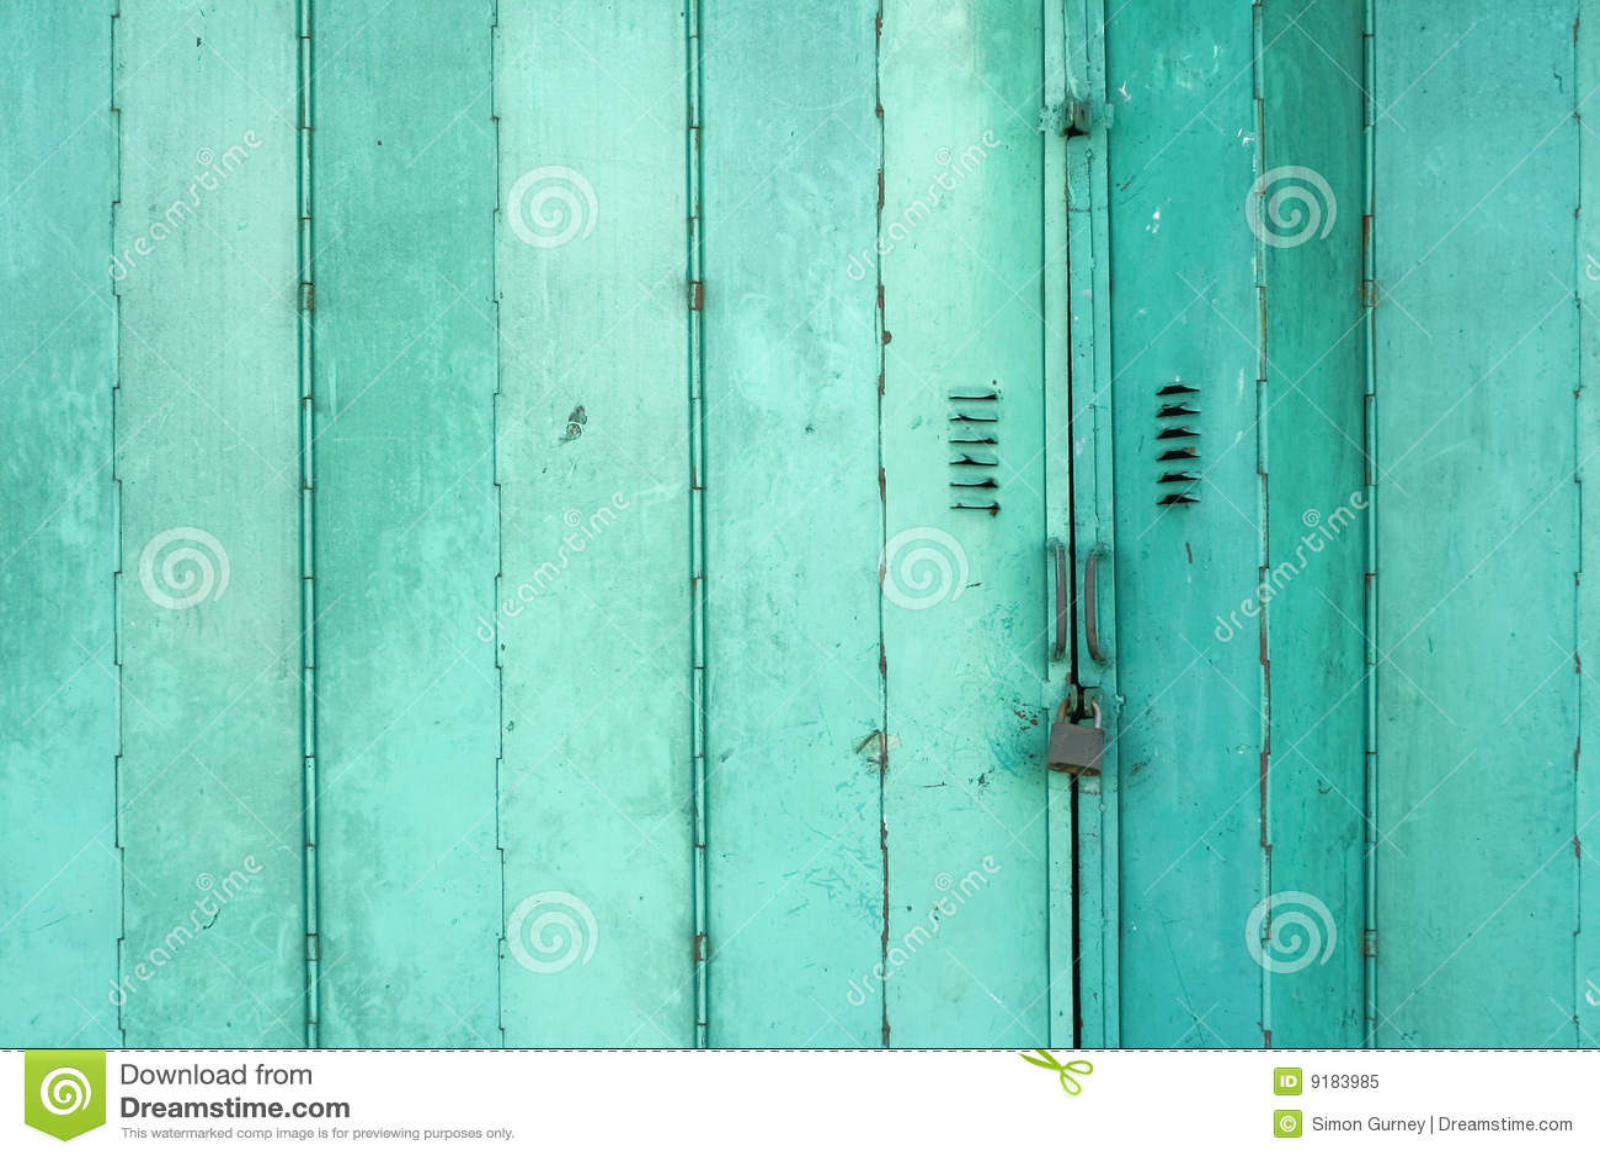 Old Green Metal Folding Doors Background Stock Image